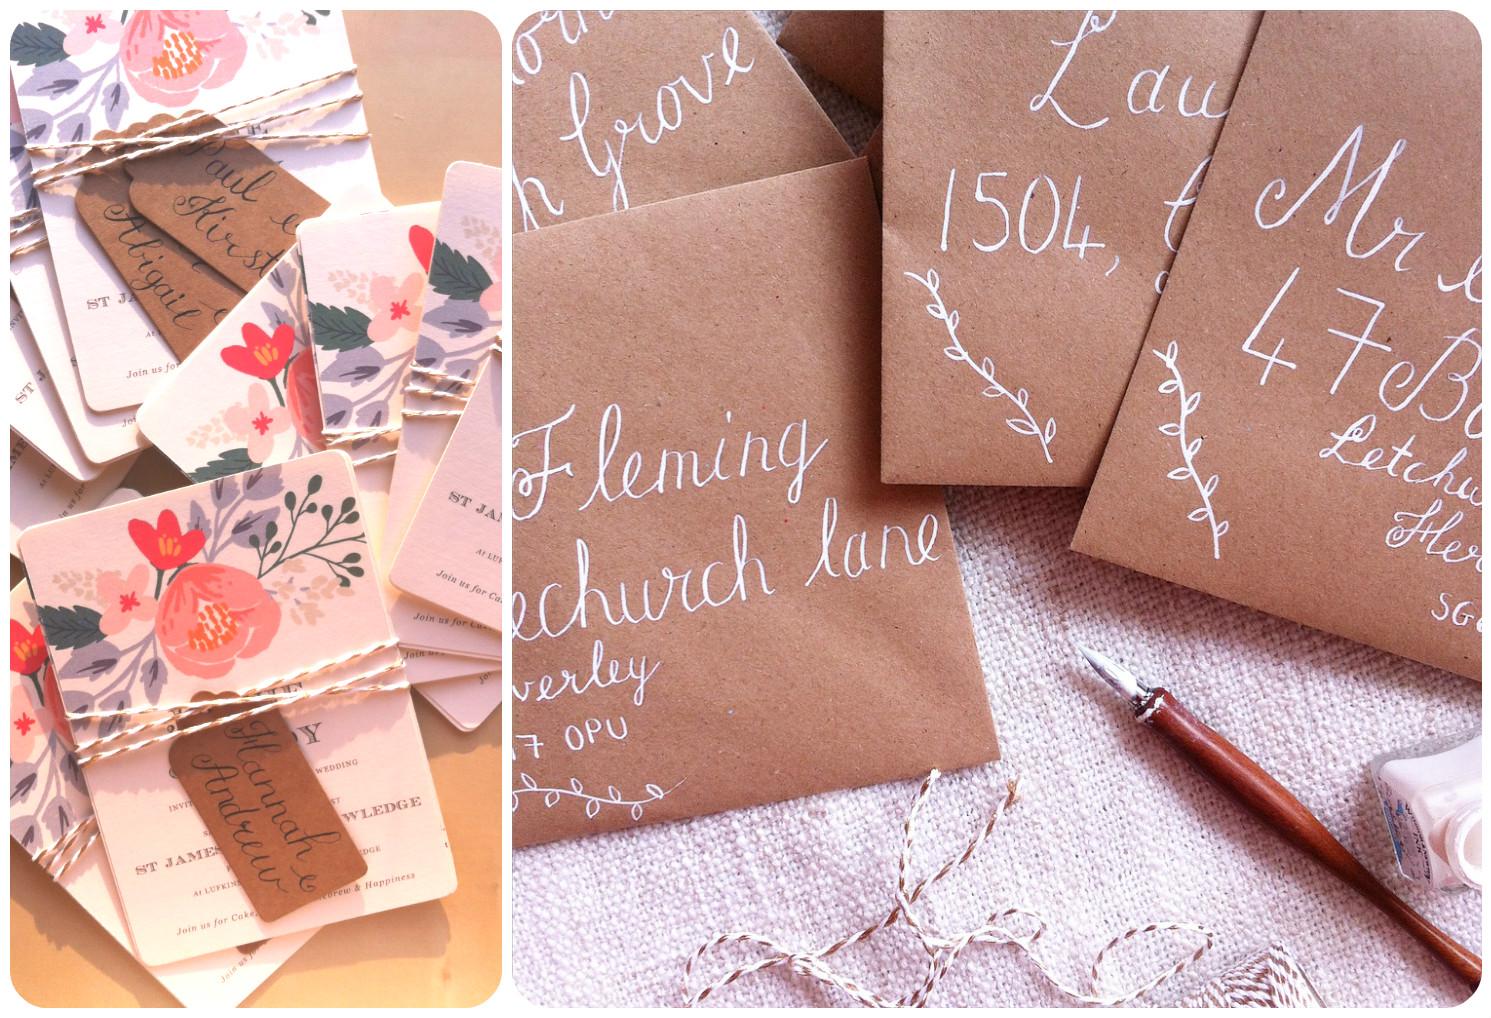 Invites and envelopes